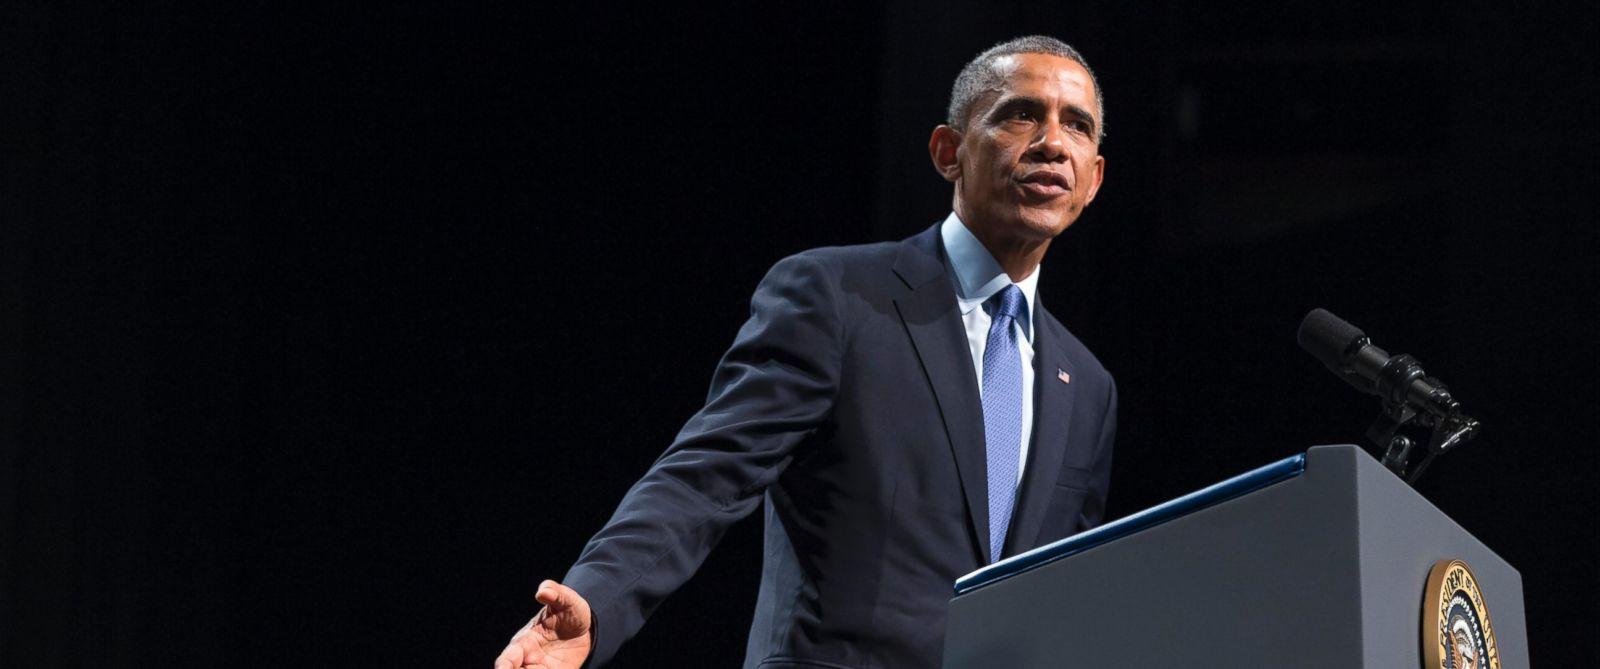 PHOTO: President Barack Obama speaks about the economy, Oct. 2, 2014, at Northwestern University in Evanston, Ill.